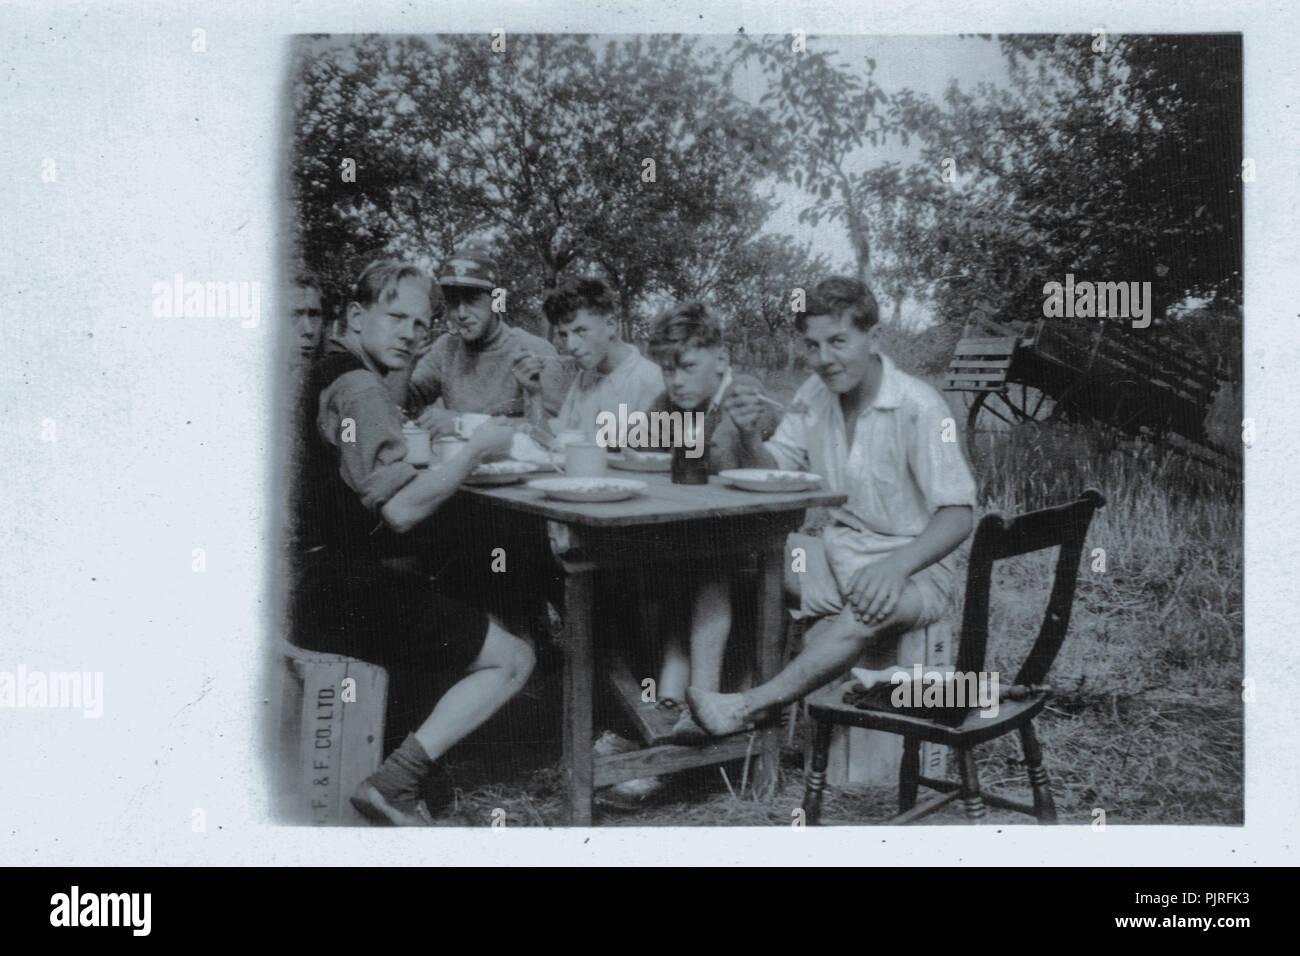 5º Jamboree Scout Mundial, celebrada en Bloemendaal Vogelenzang Holanda, Holanda,1937 Imagen De Stock